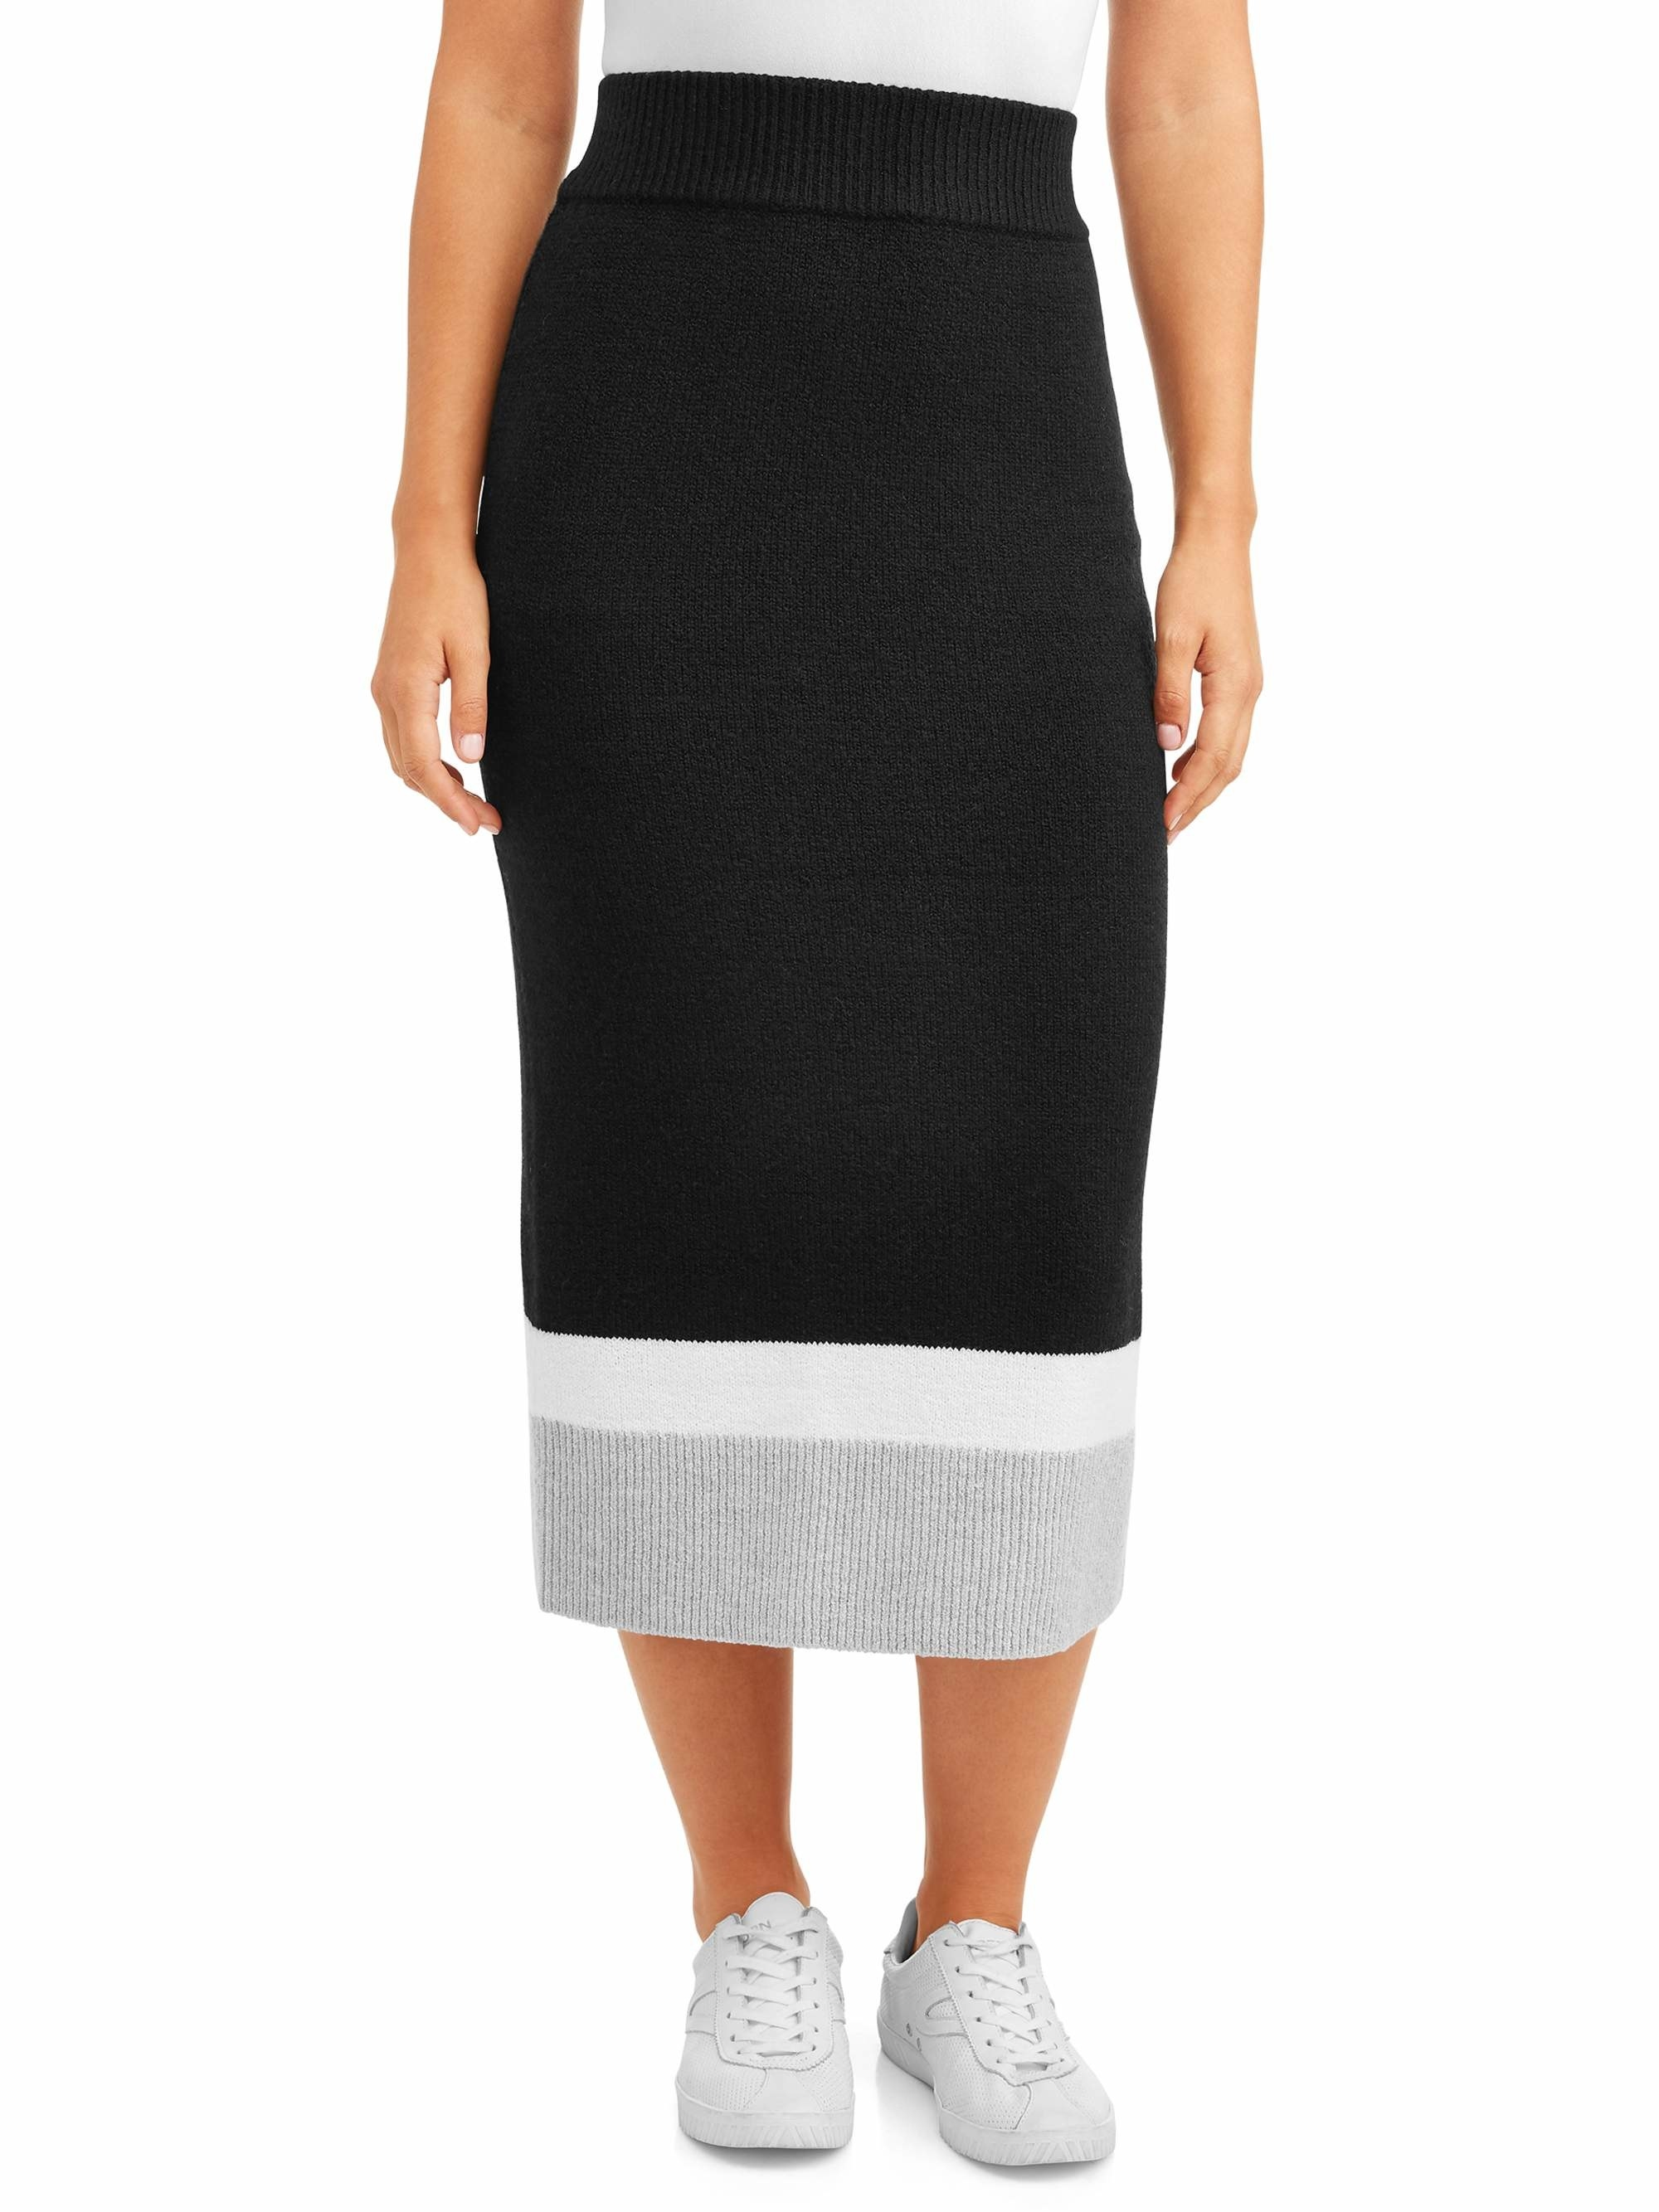 Model wears the striped skirt